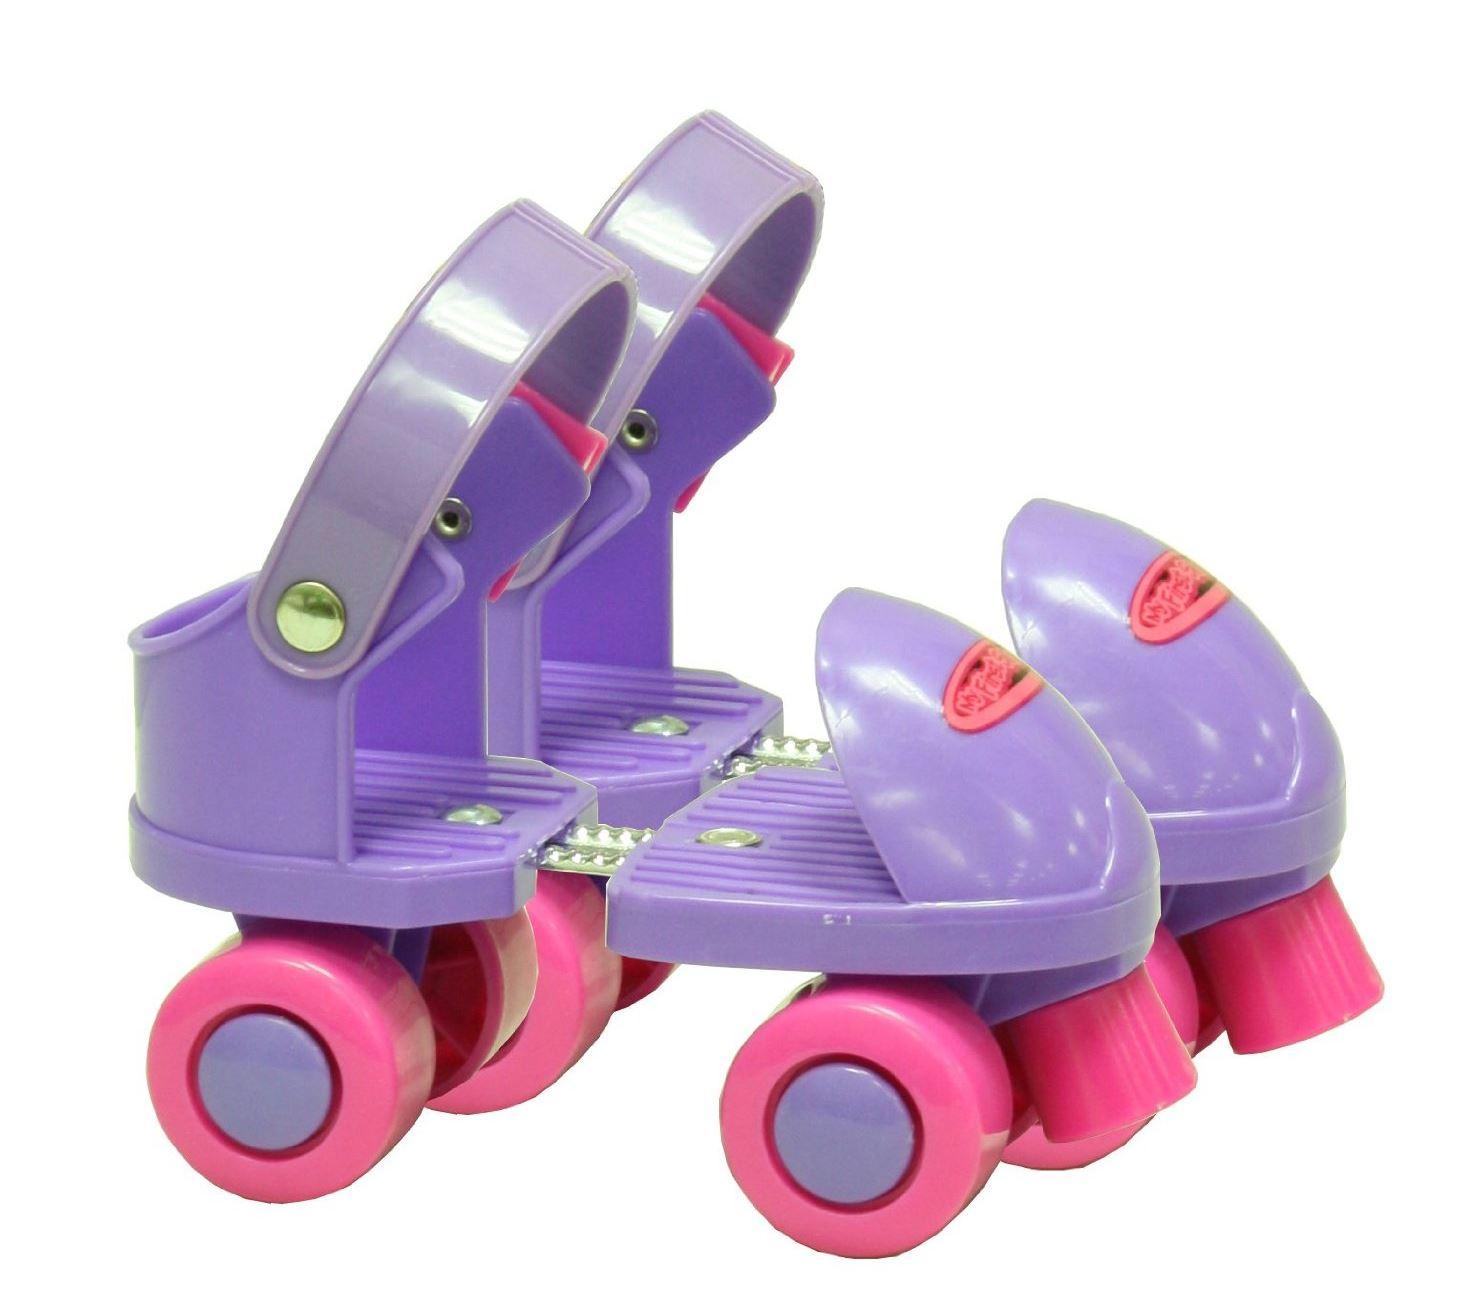 preschool skates ozbozz my rollerskates toddler junior infant 560